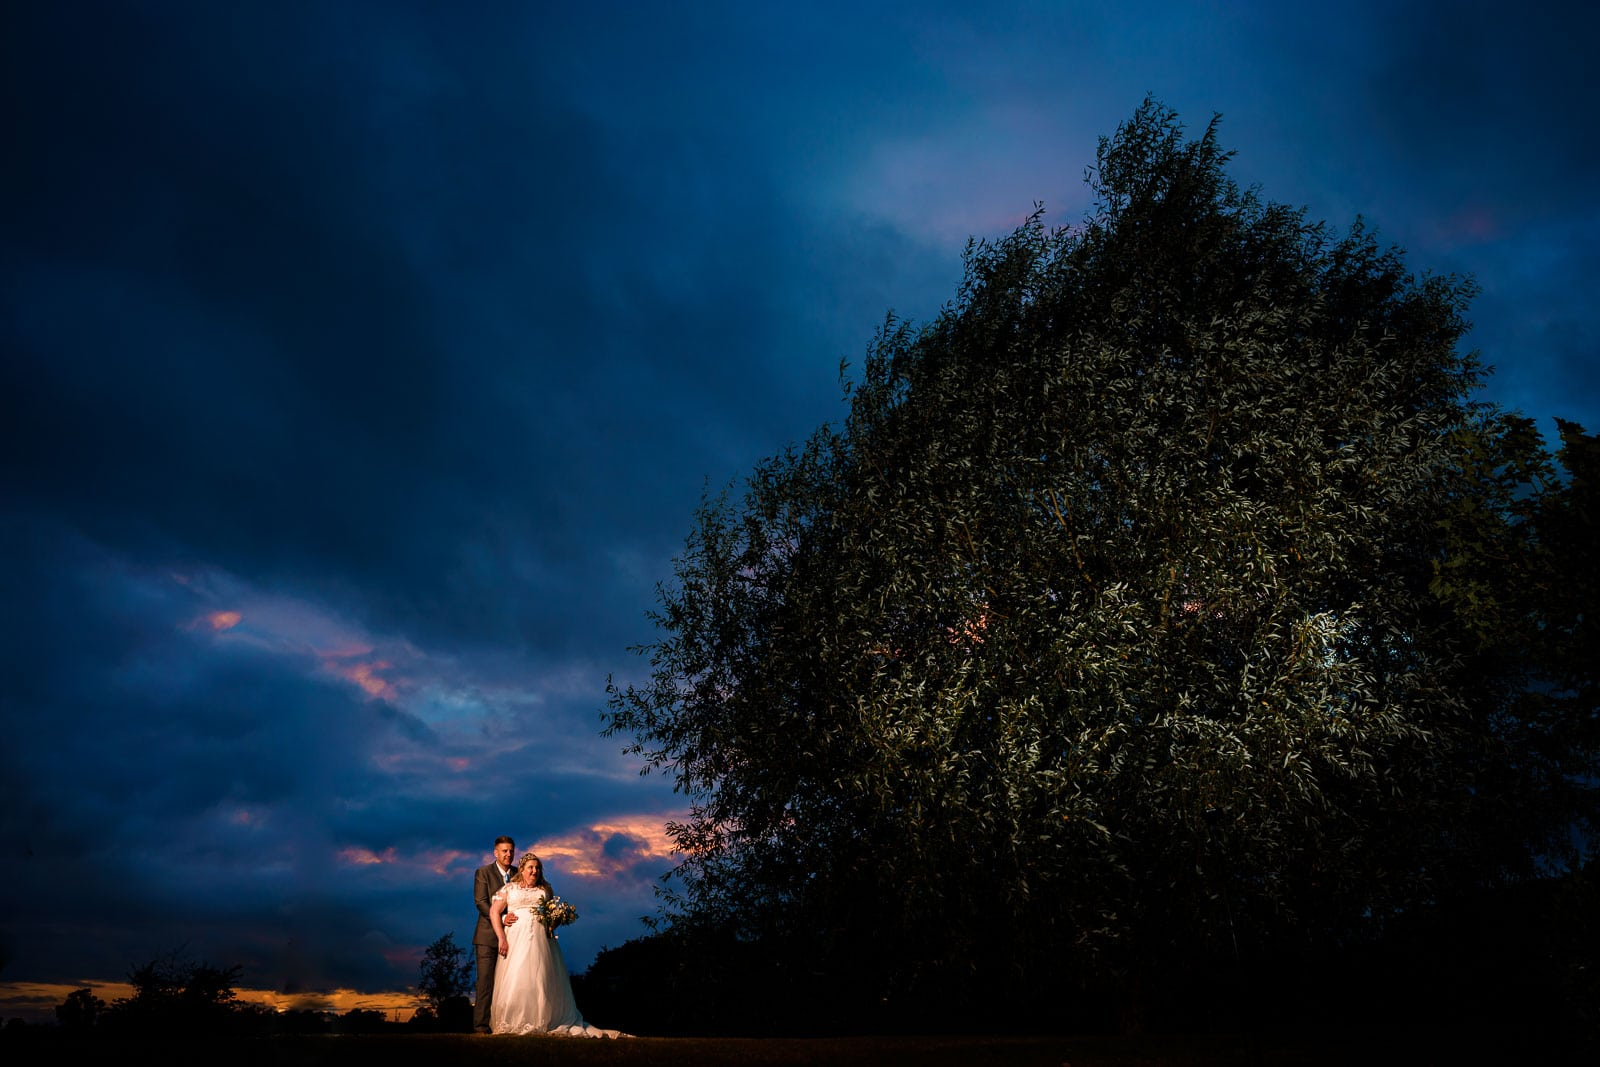 Wootton Park wedding photography using godox lights to illuminate bride and groom